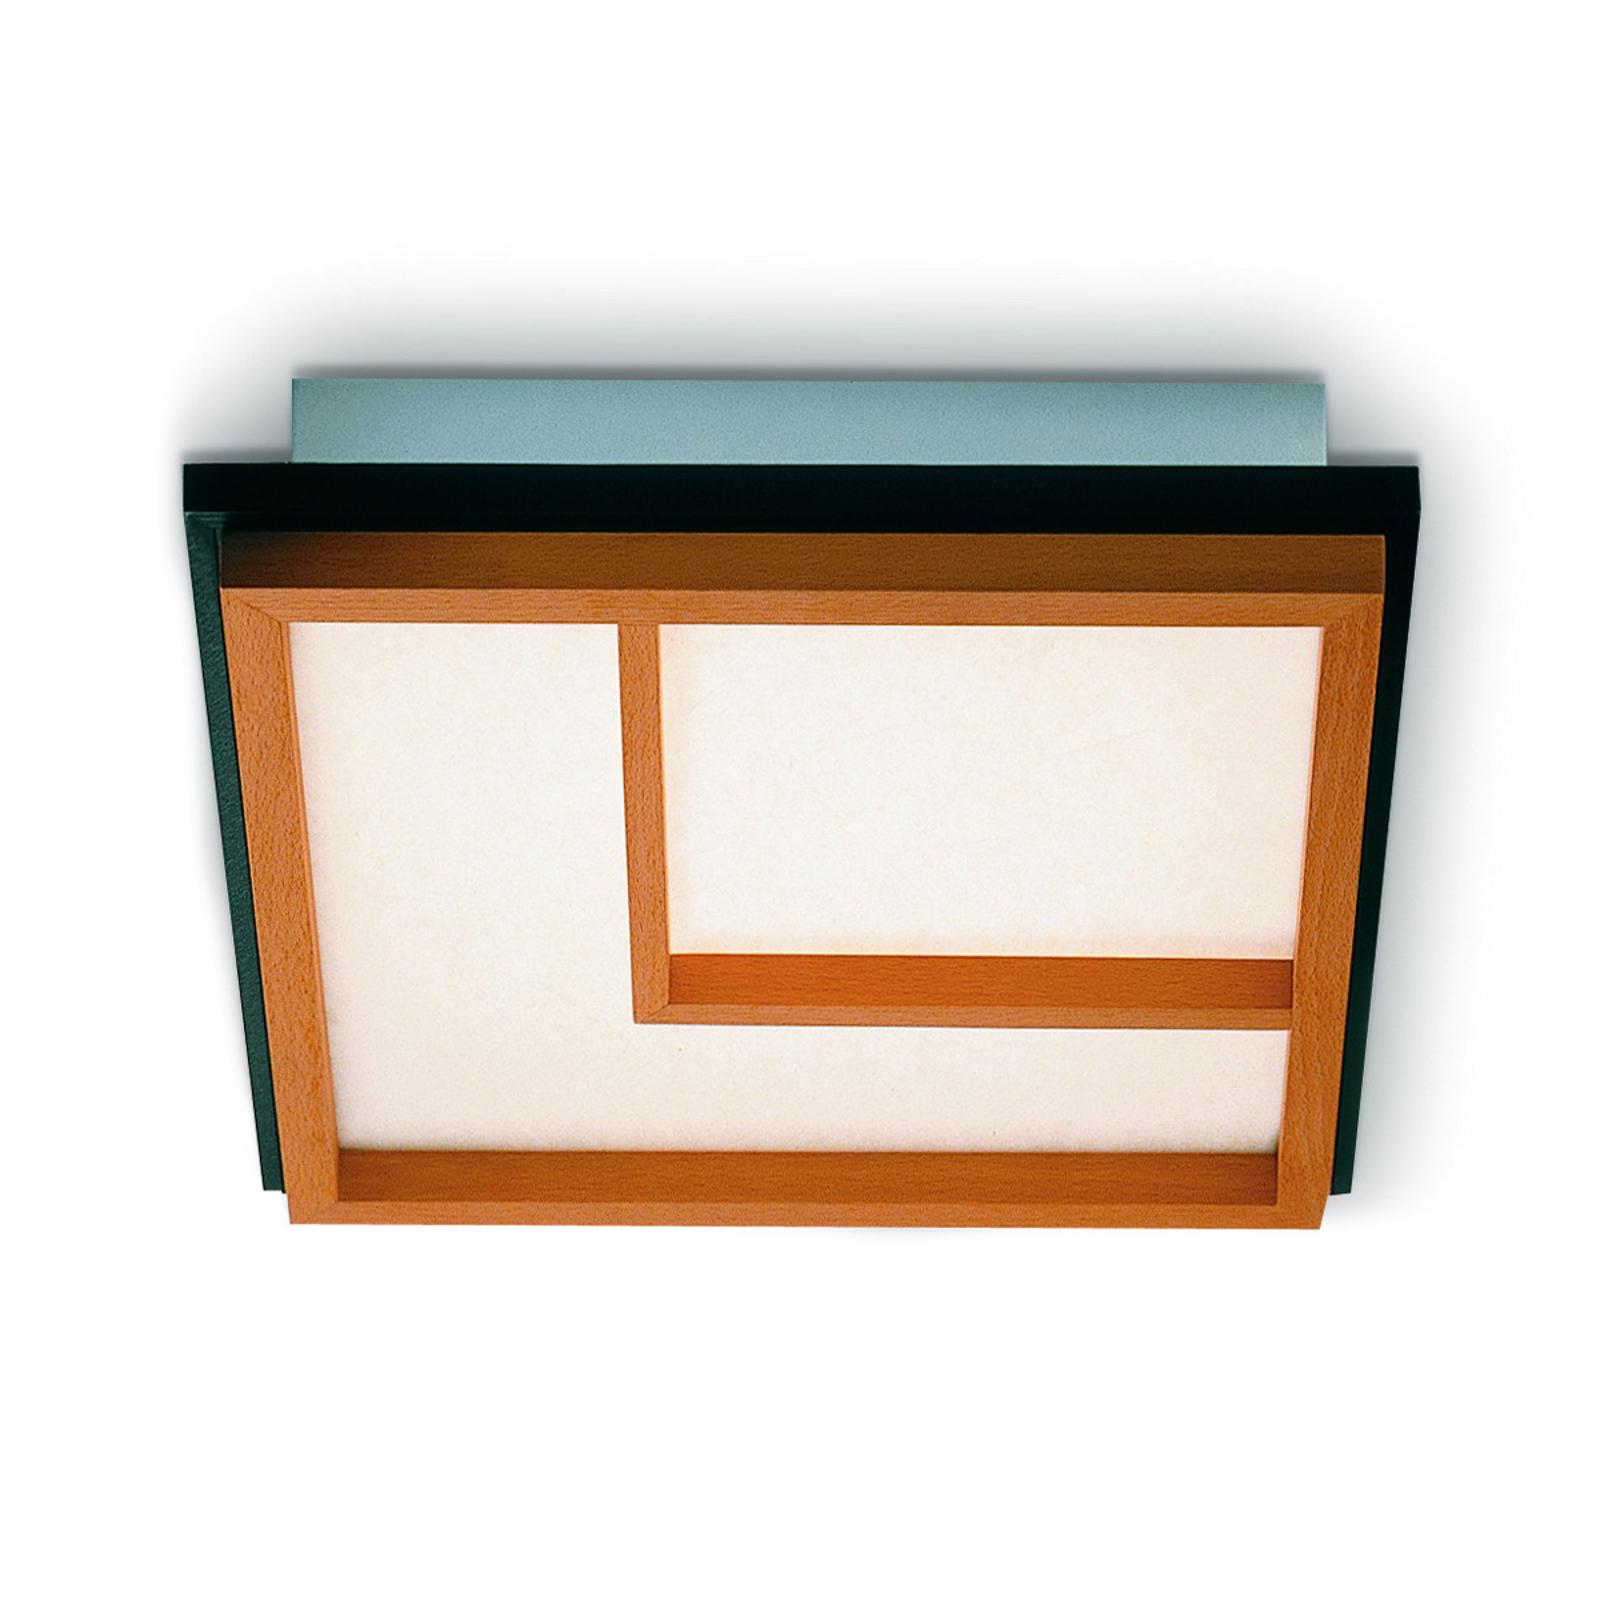 Kioto 2 - Buchenholz-LED-Deckenleuchte